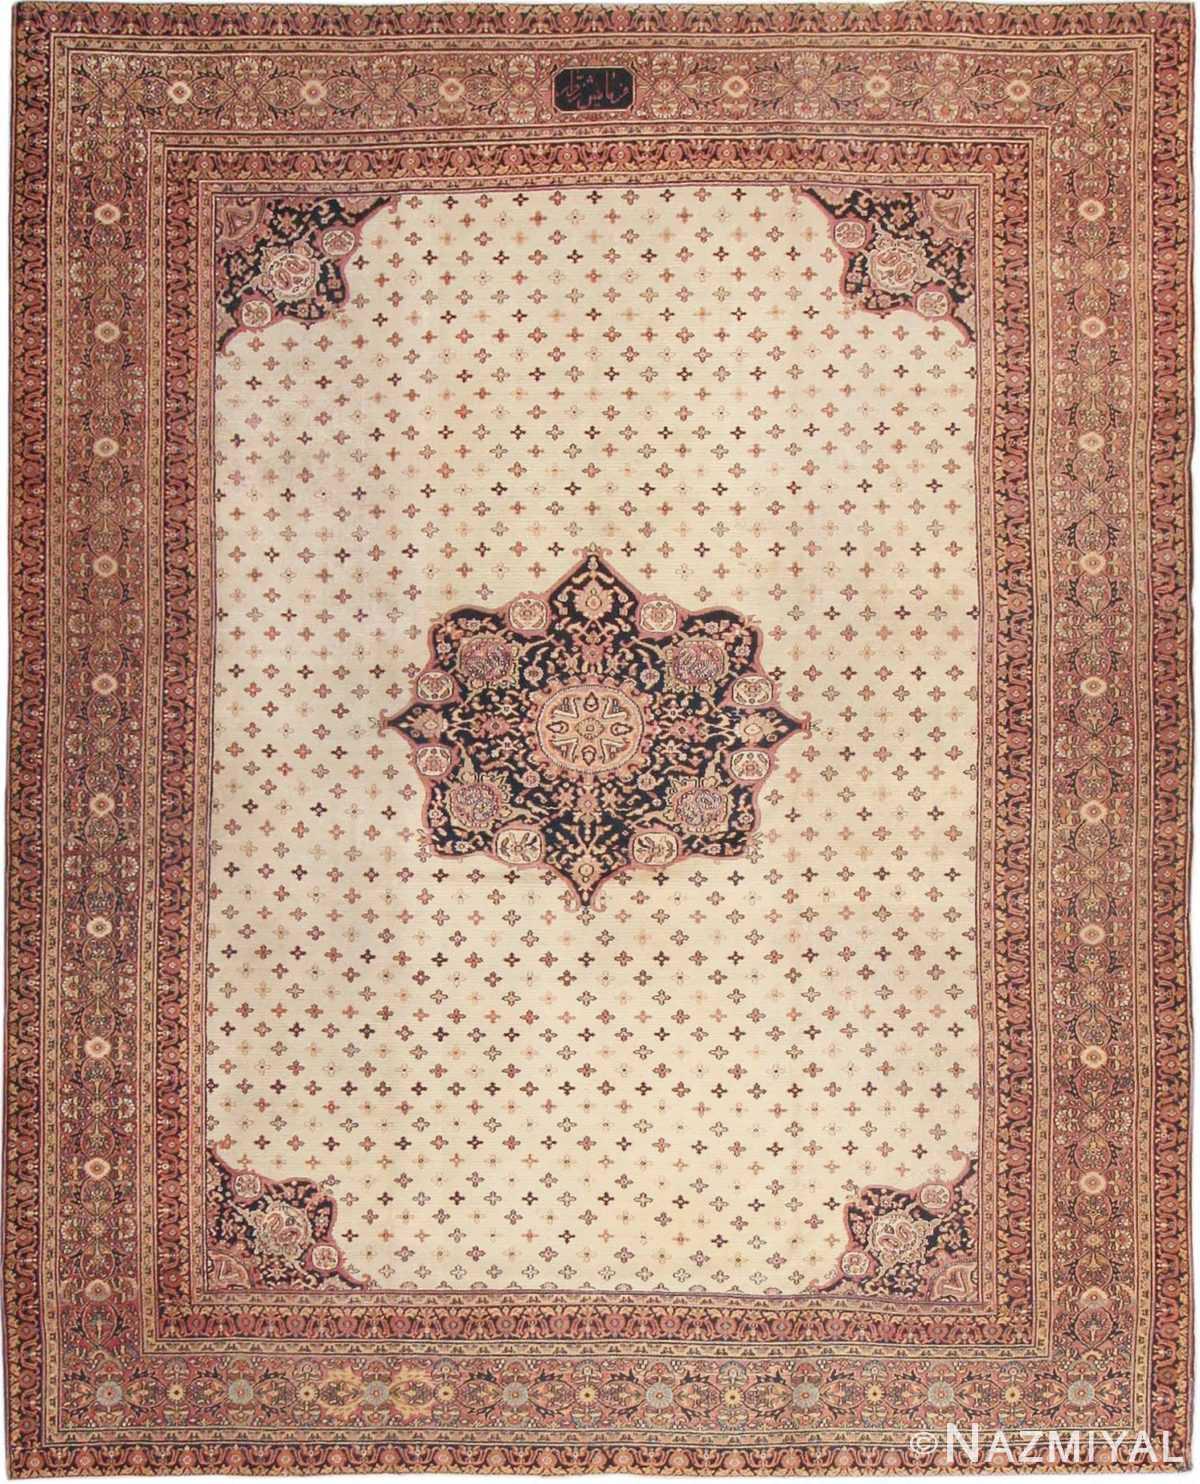 antique persian khorassan rug 854 Nazmiyal